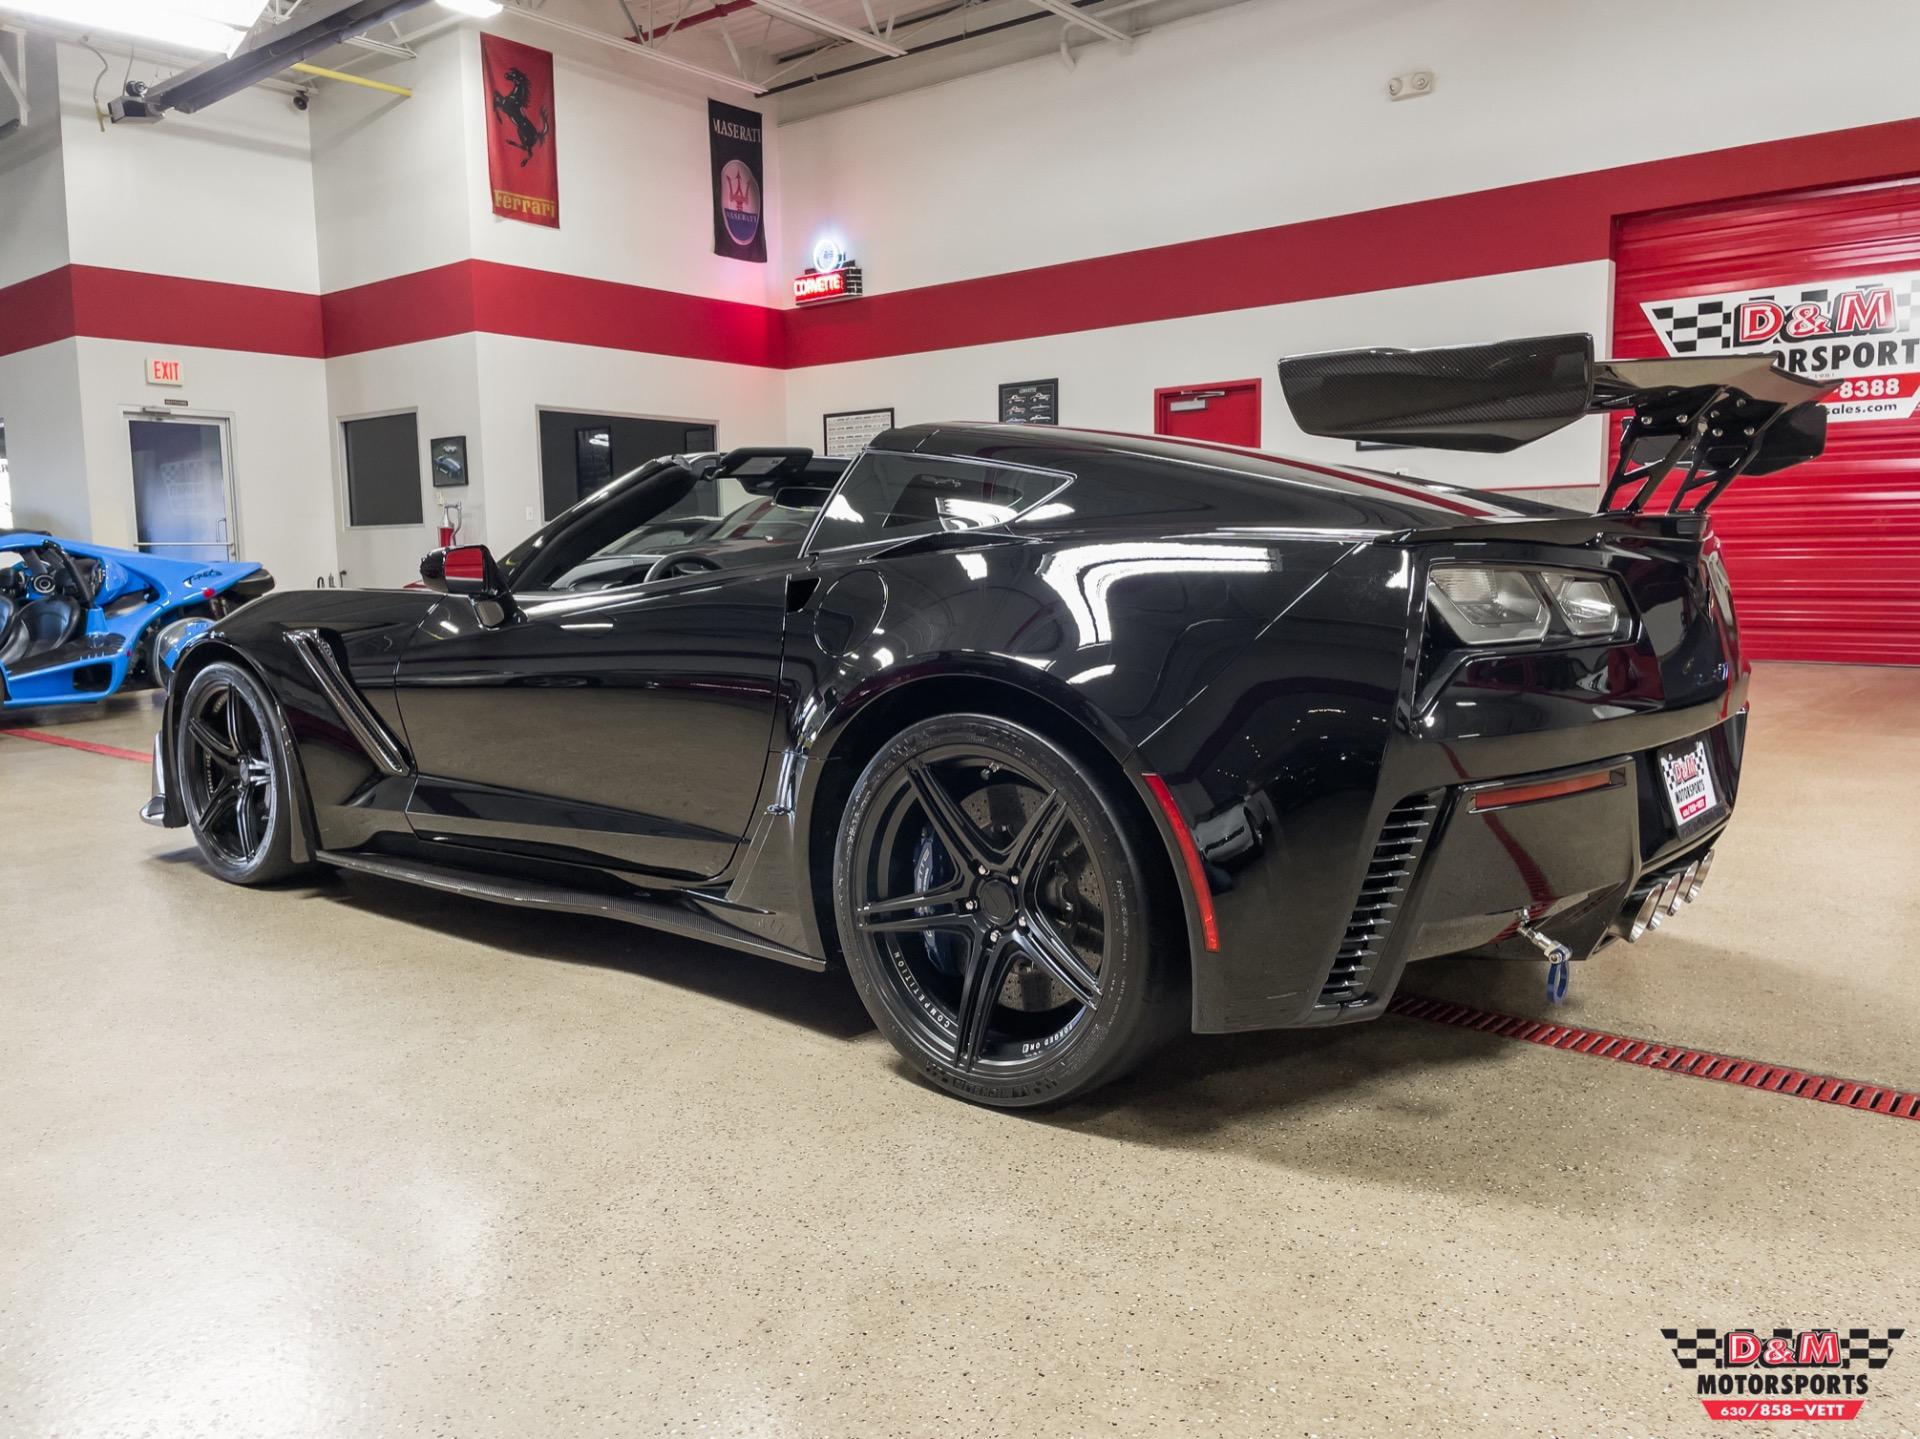 Used 2019 Chevrolet Corvette ZR1 Coupe | Glen Ellyn, IL